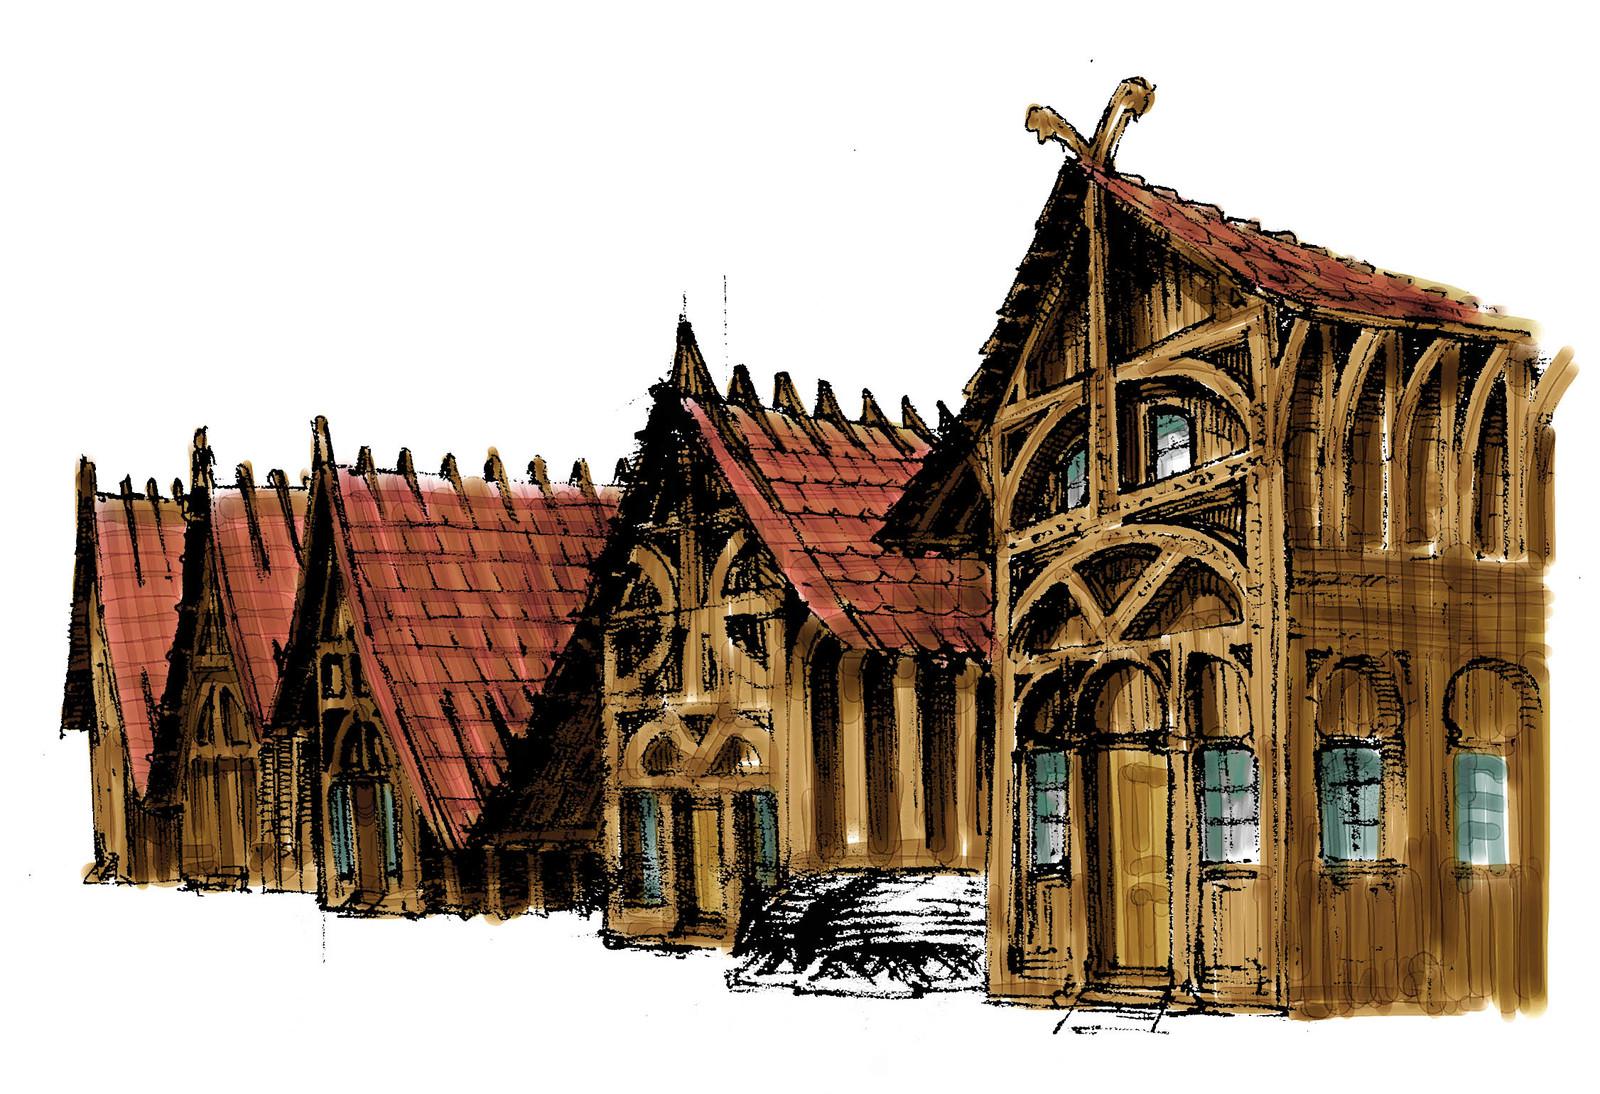 Esgaroth buildings